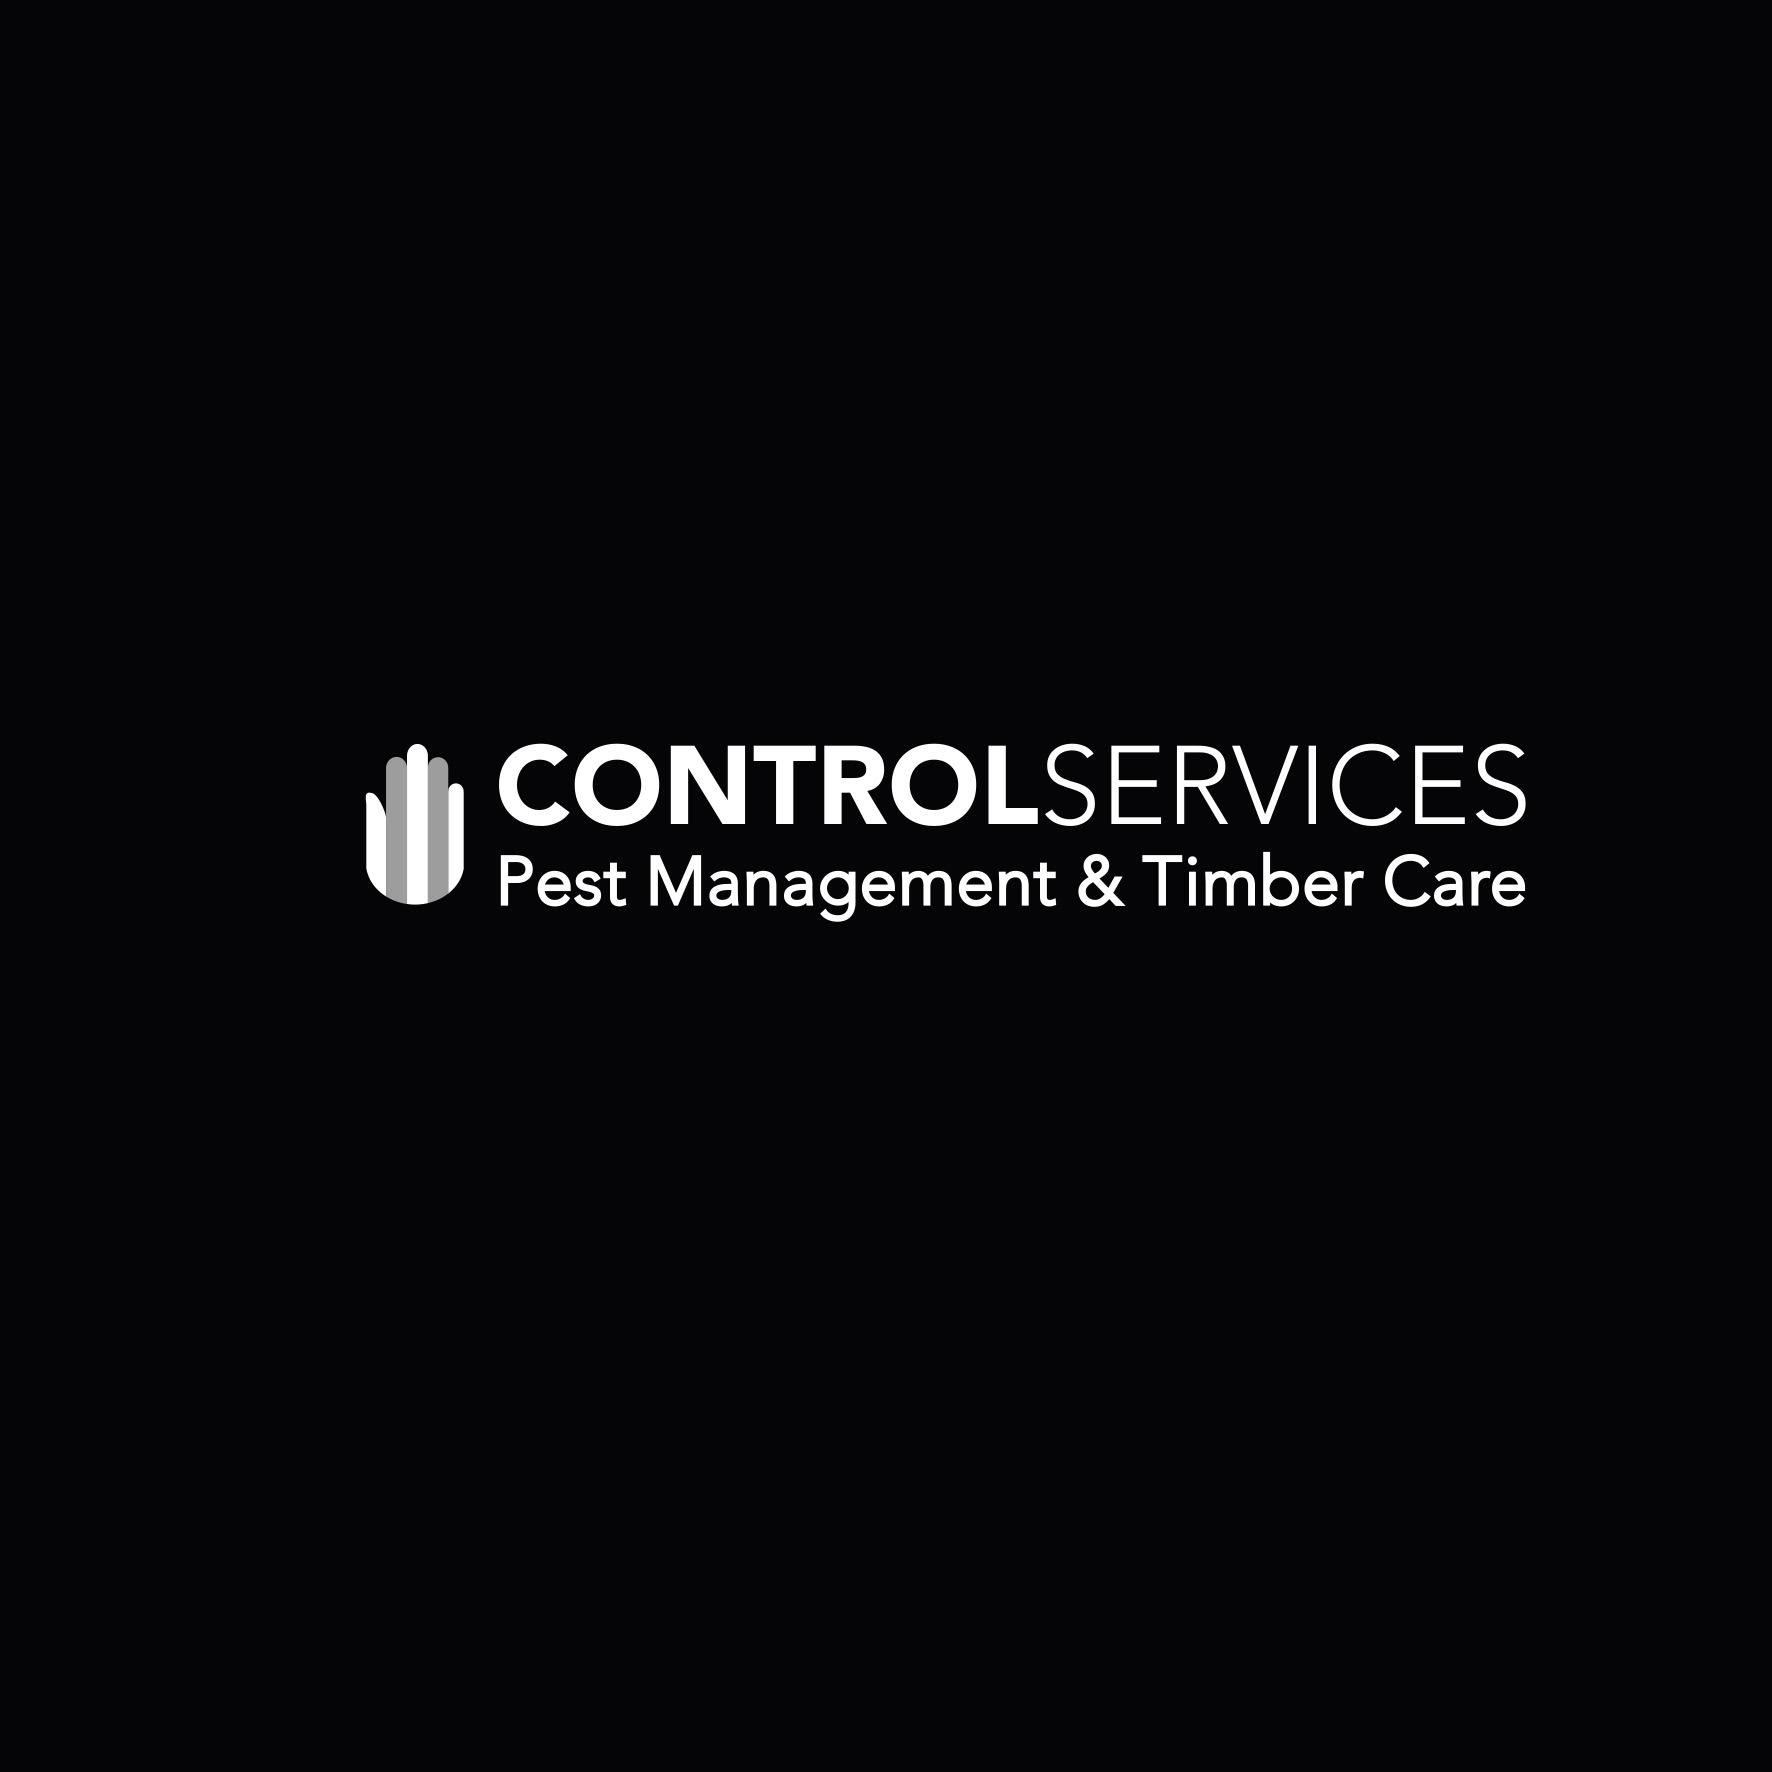 Control Services